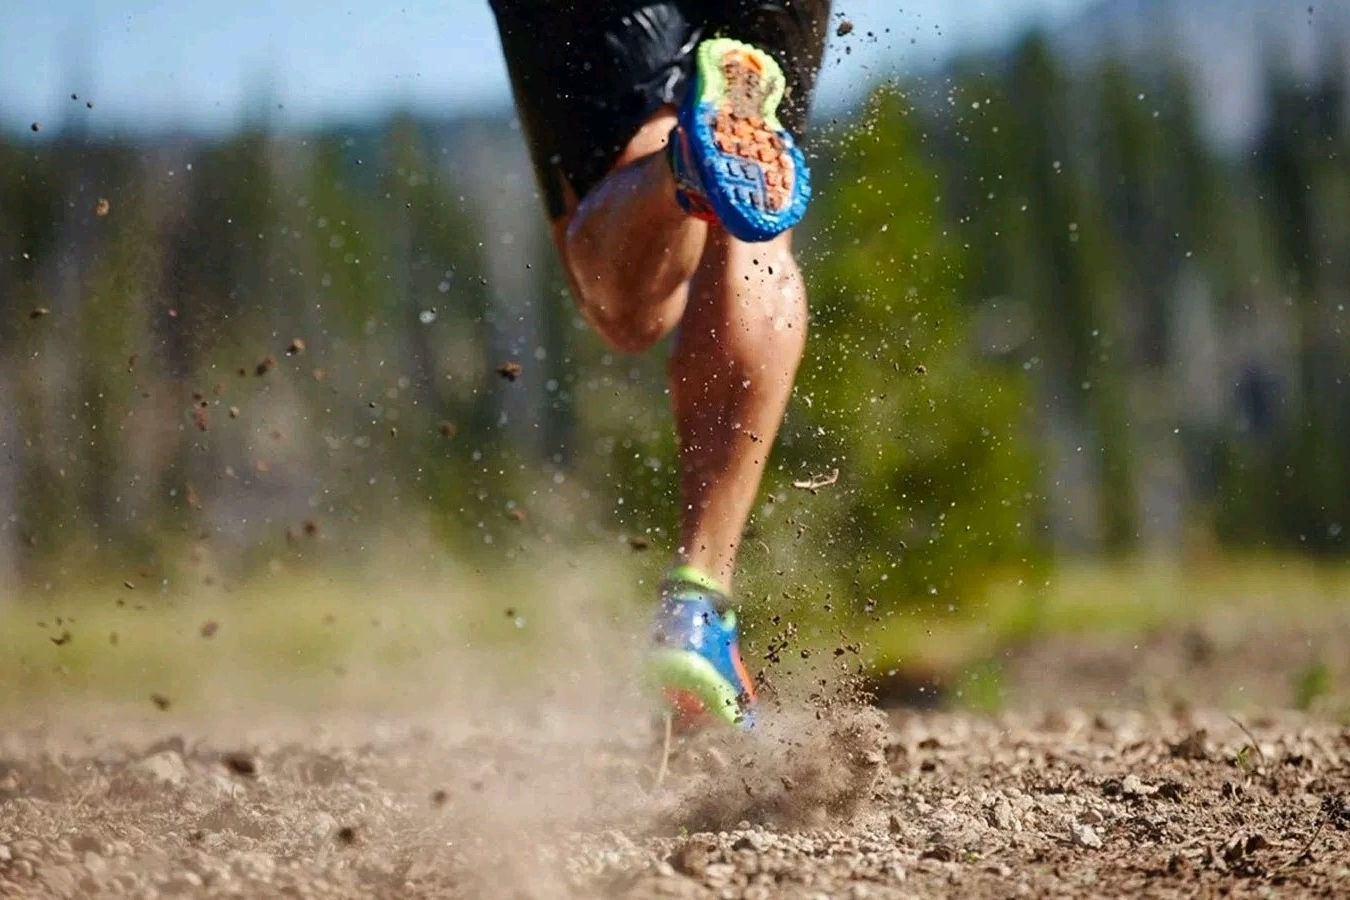 Running sobre caminos de tierra